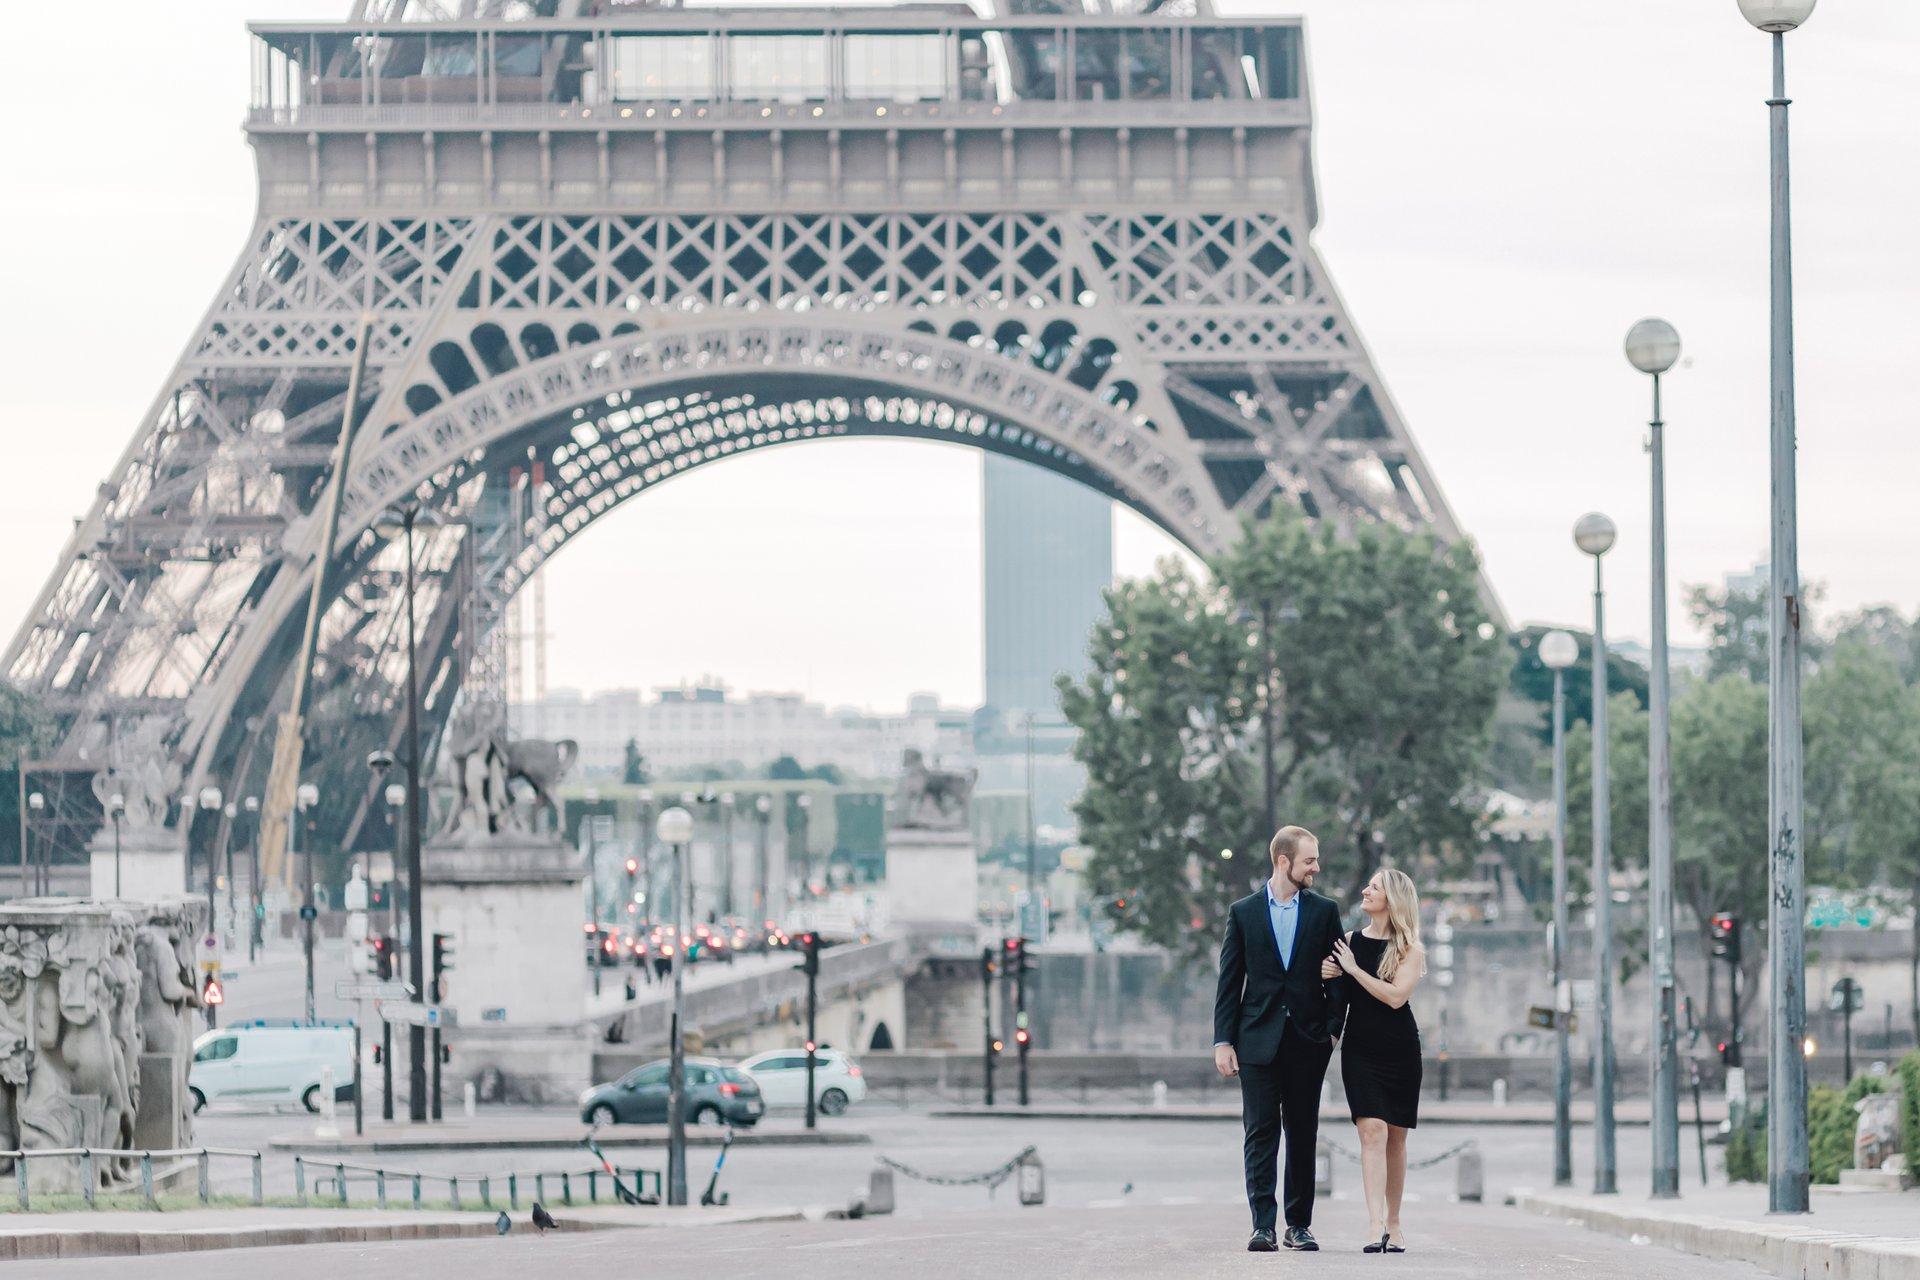 Paris-France-travel-story-Flytographer-13